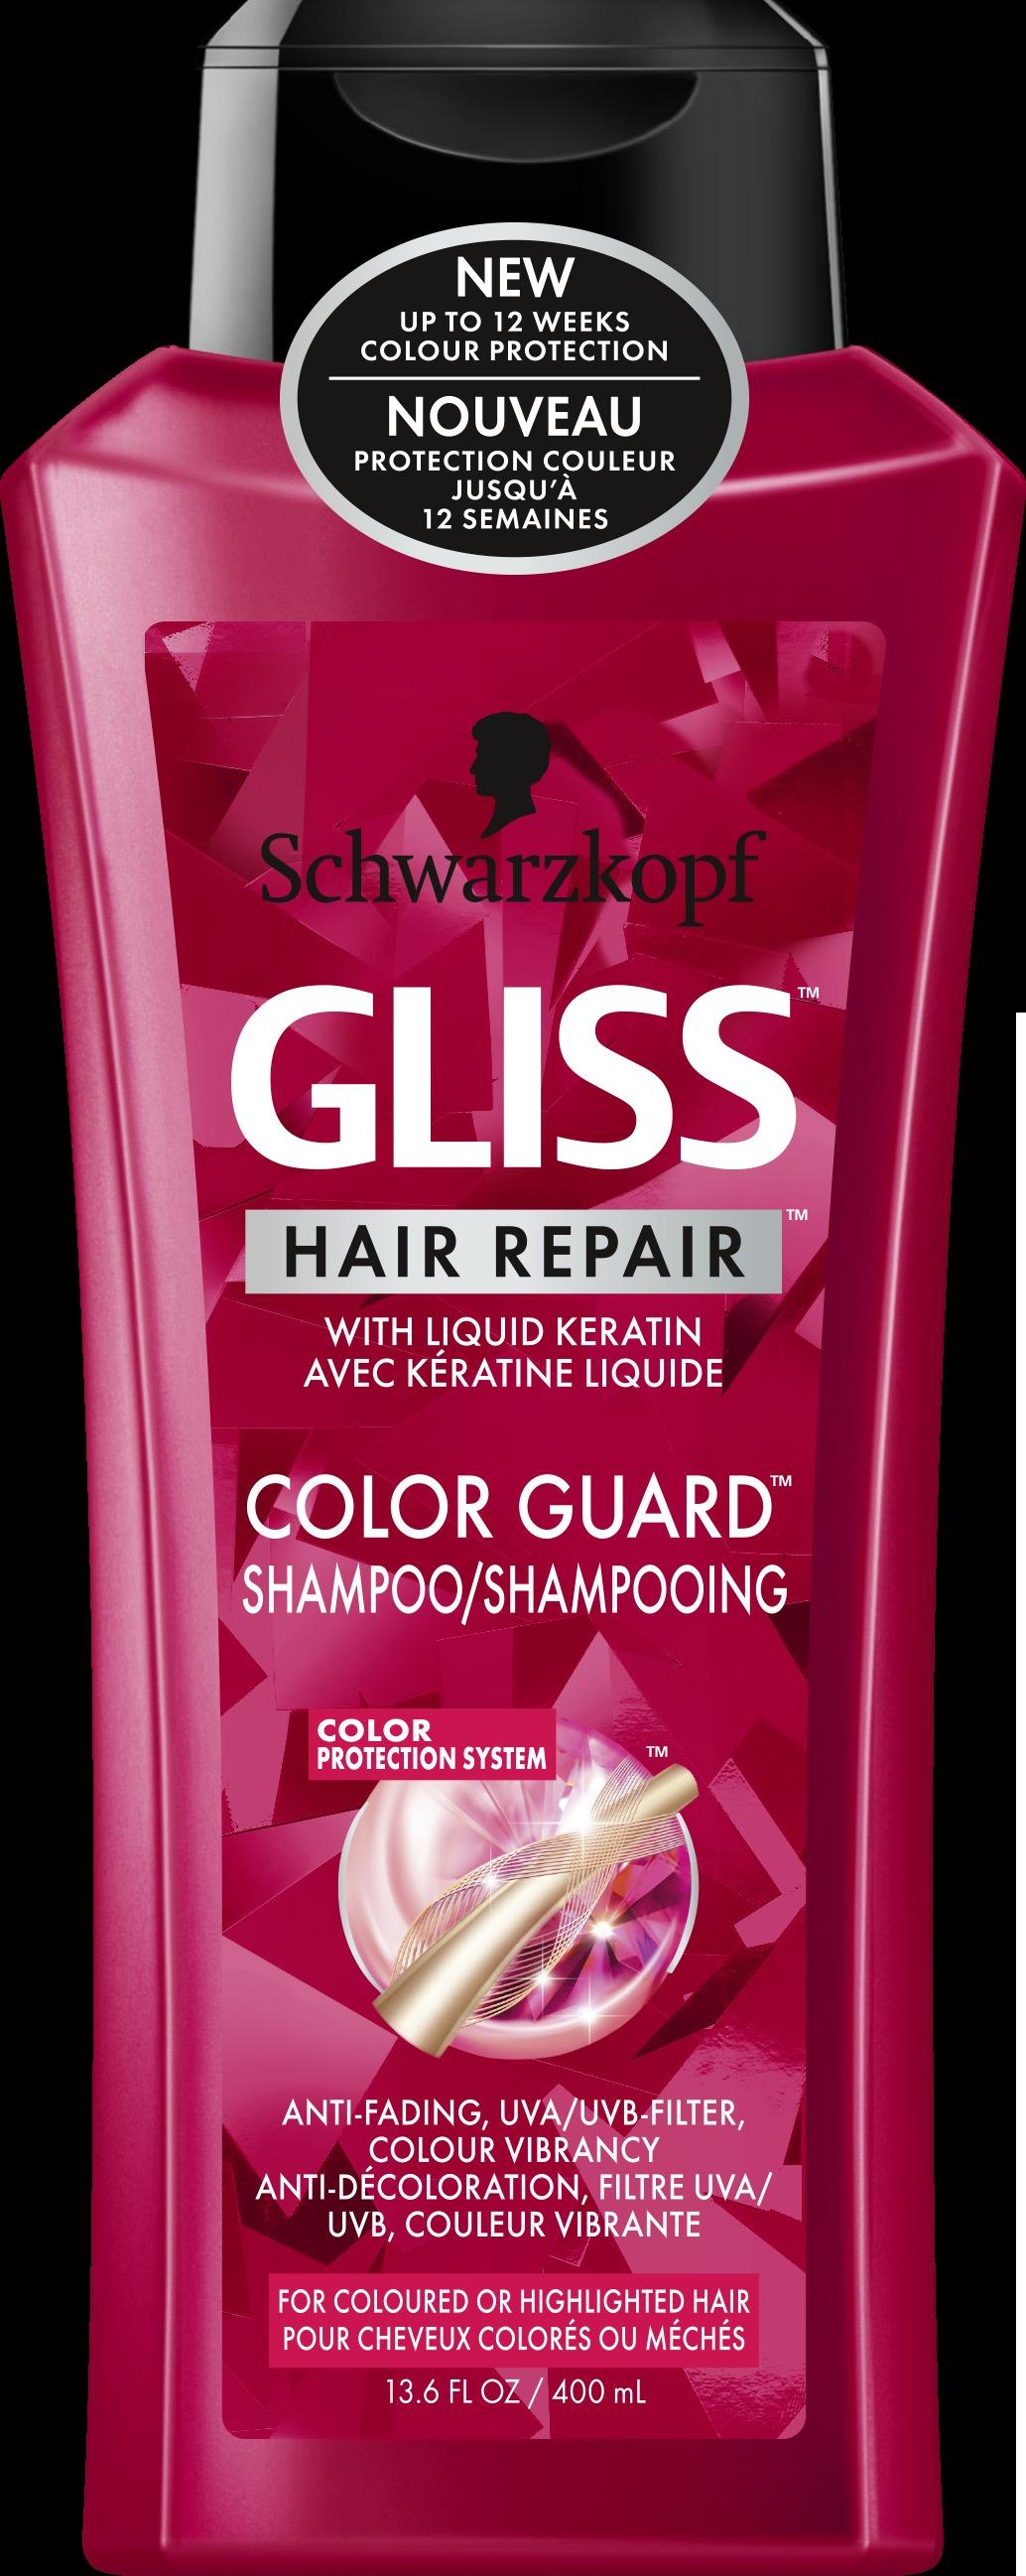 Gliss Color Guard Shampoo Reviews In Shampoo Chickadvisor